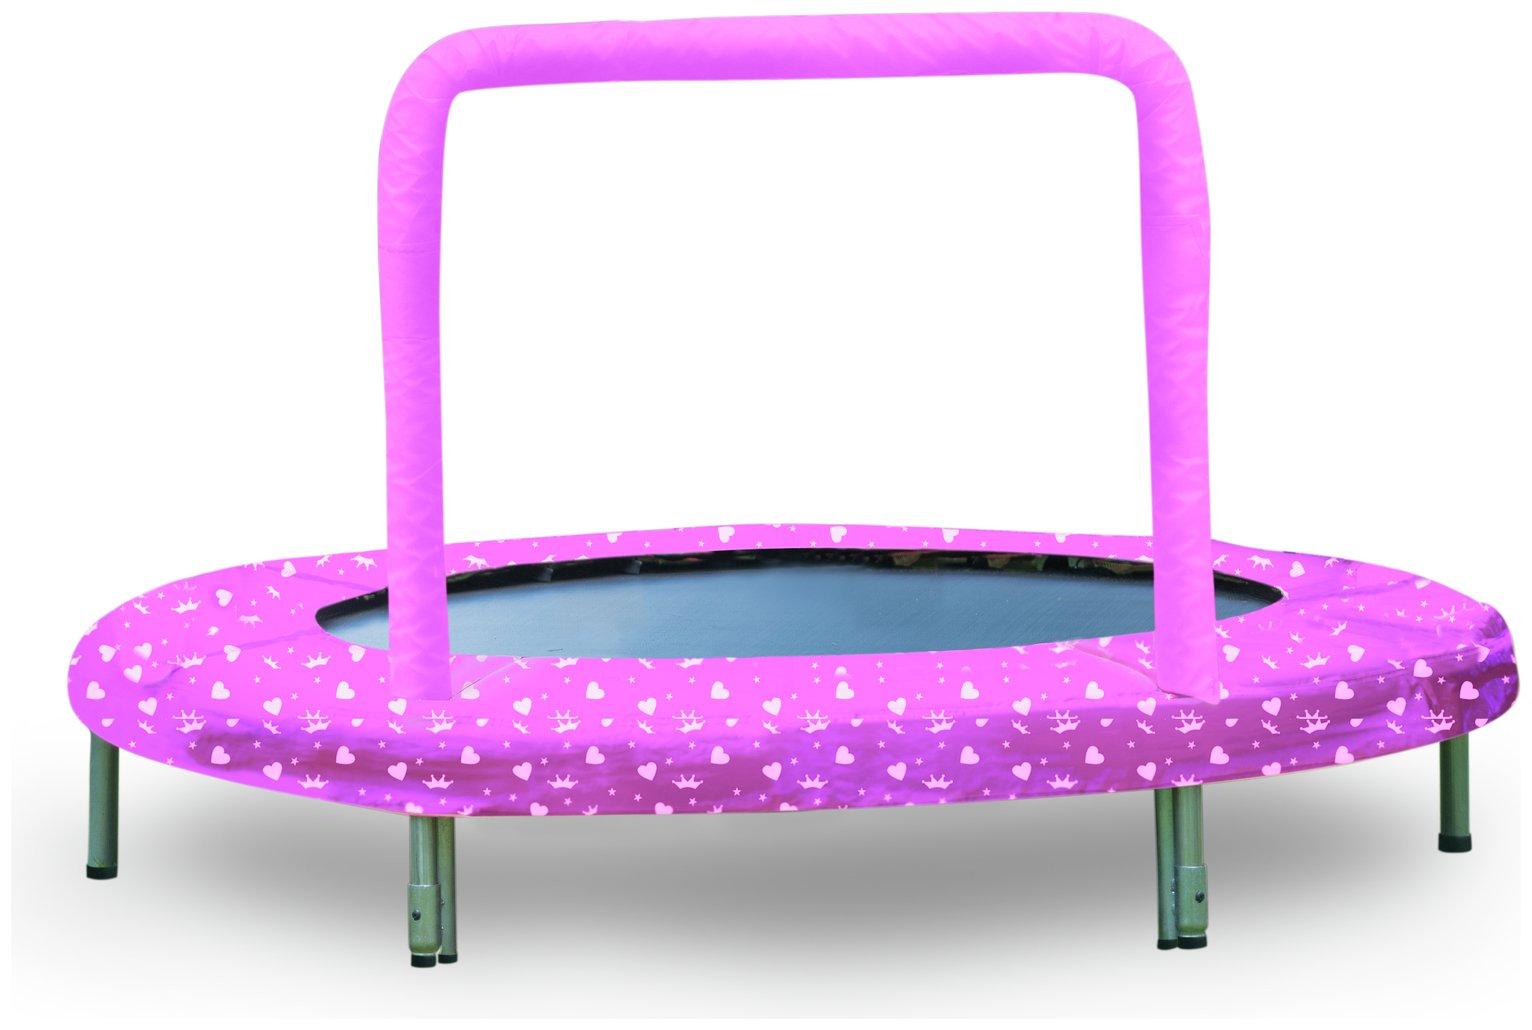 Bazoongi Princess Mini Bouncer Trampoline